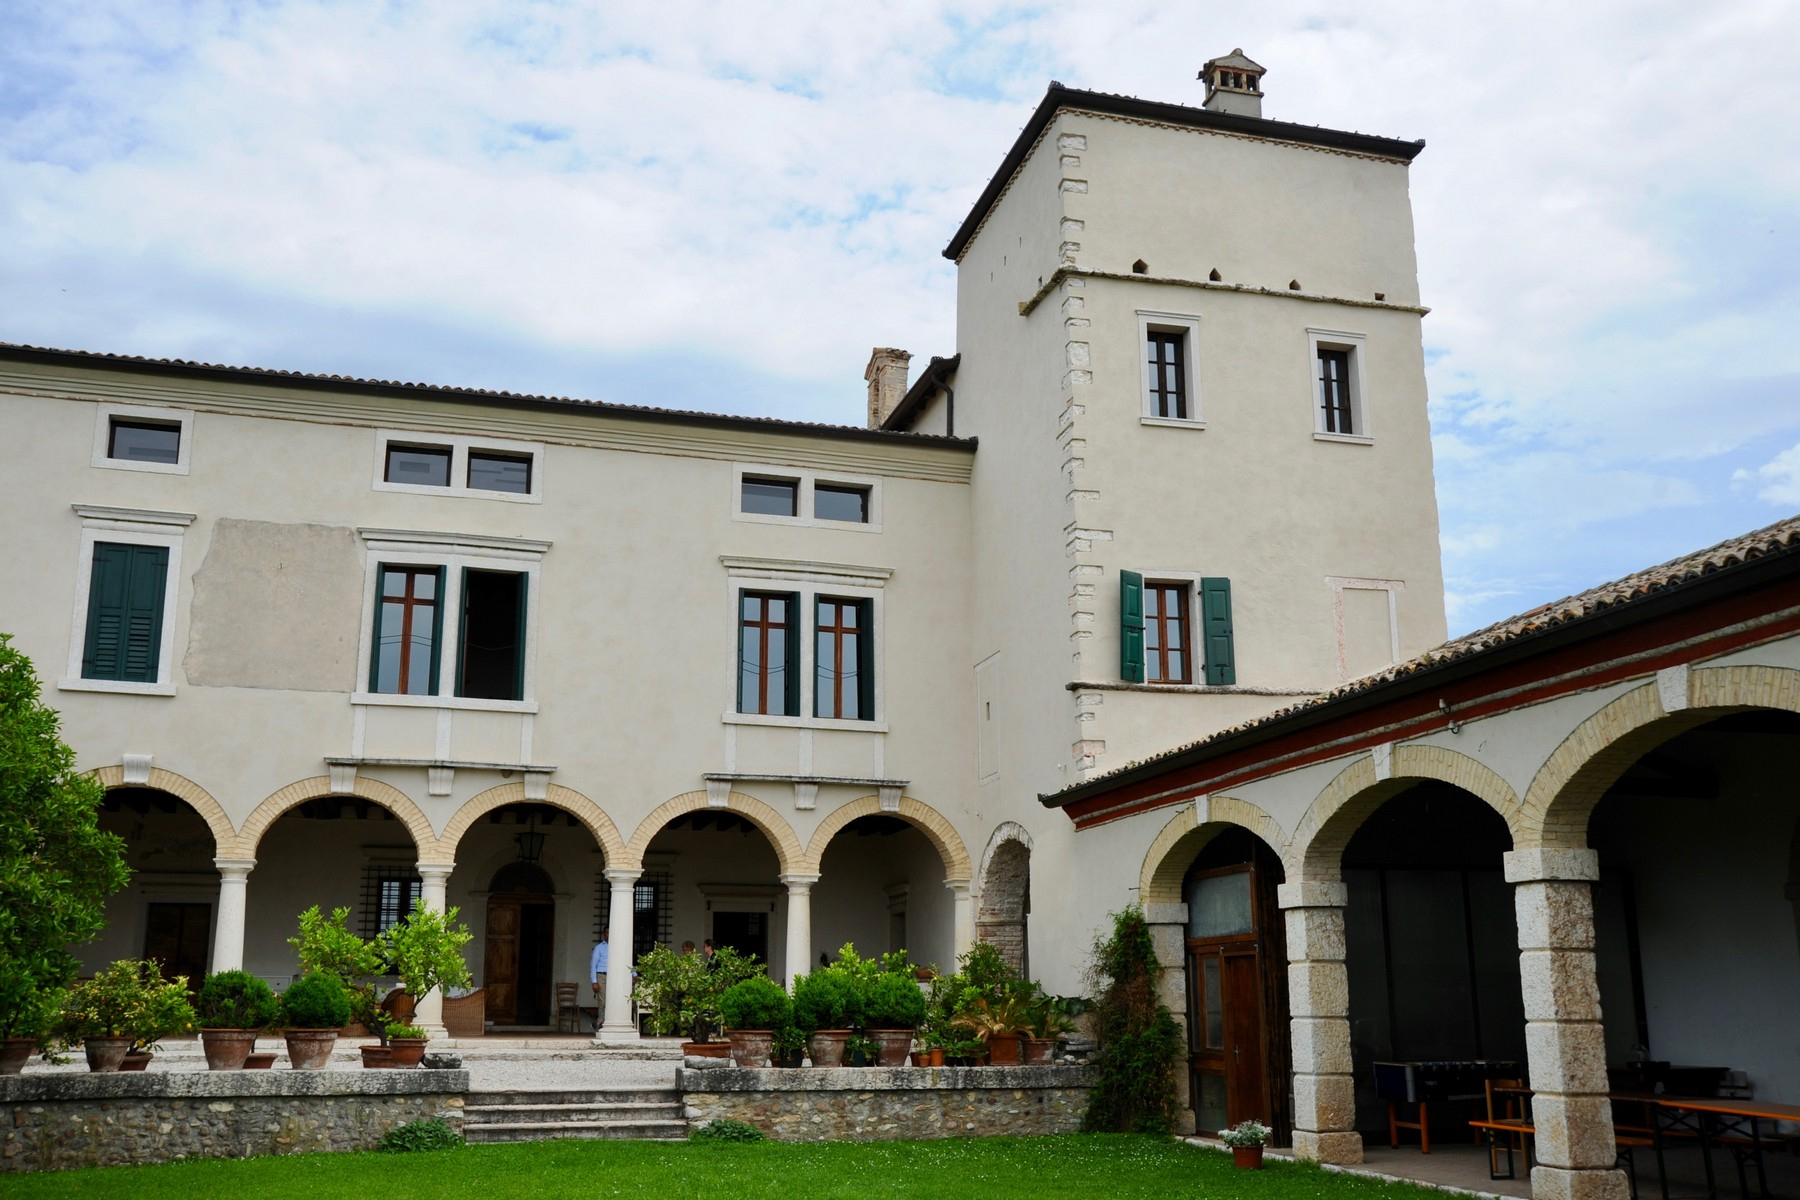 Villa in Vendita a Verona: 5 locali, 450 mq - Foto 23